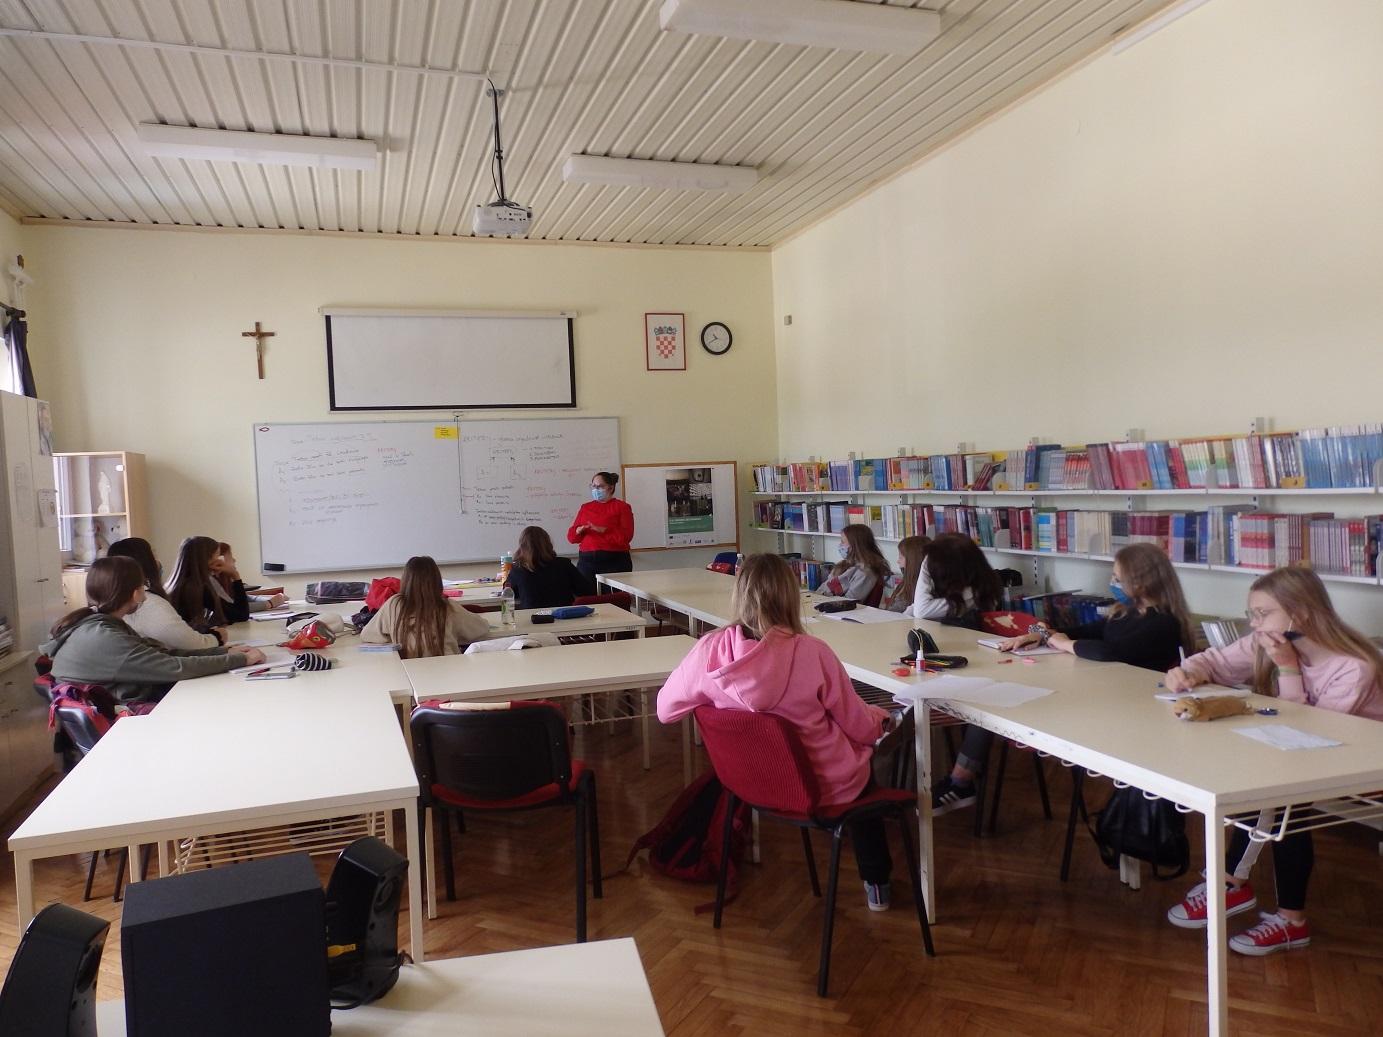 Novi debatni klub u Osnovnoj školi Sveti Petar Orehovec